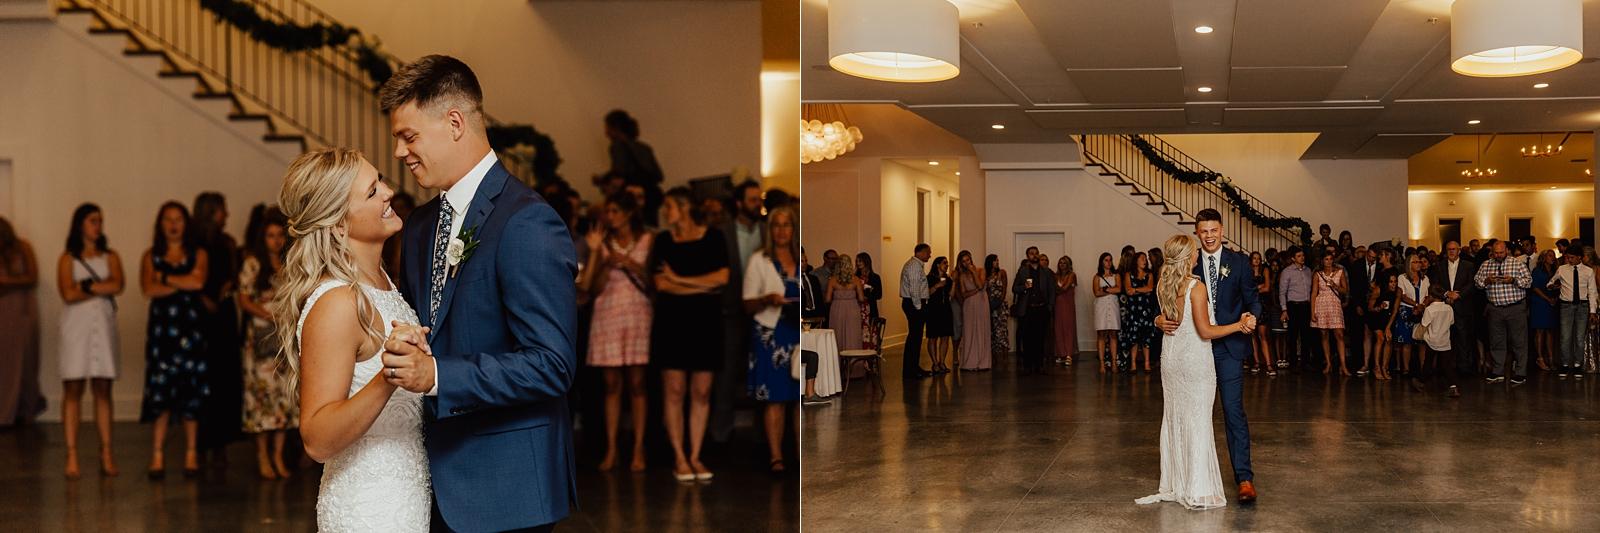 Anna & Trey Modern Minneapolis Wedding at The Hutton House_0740.jpg